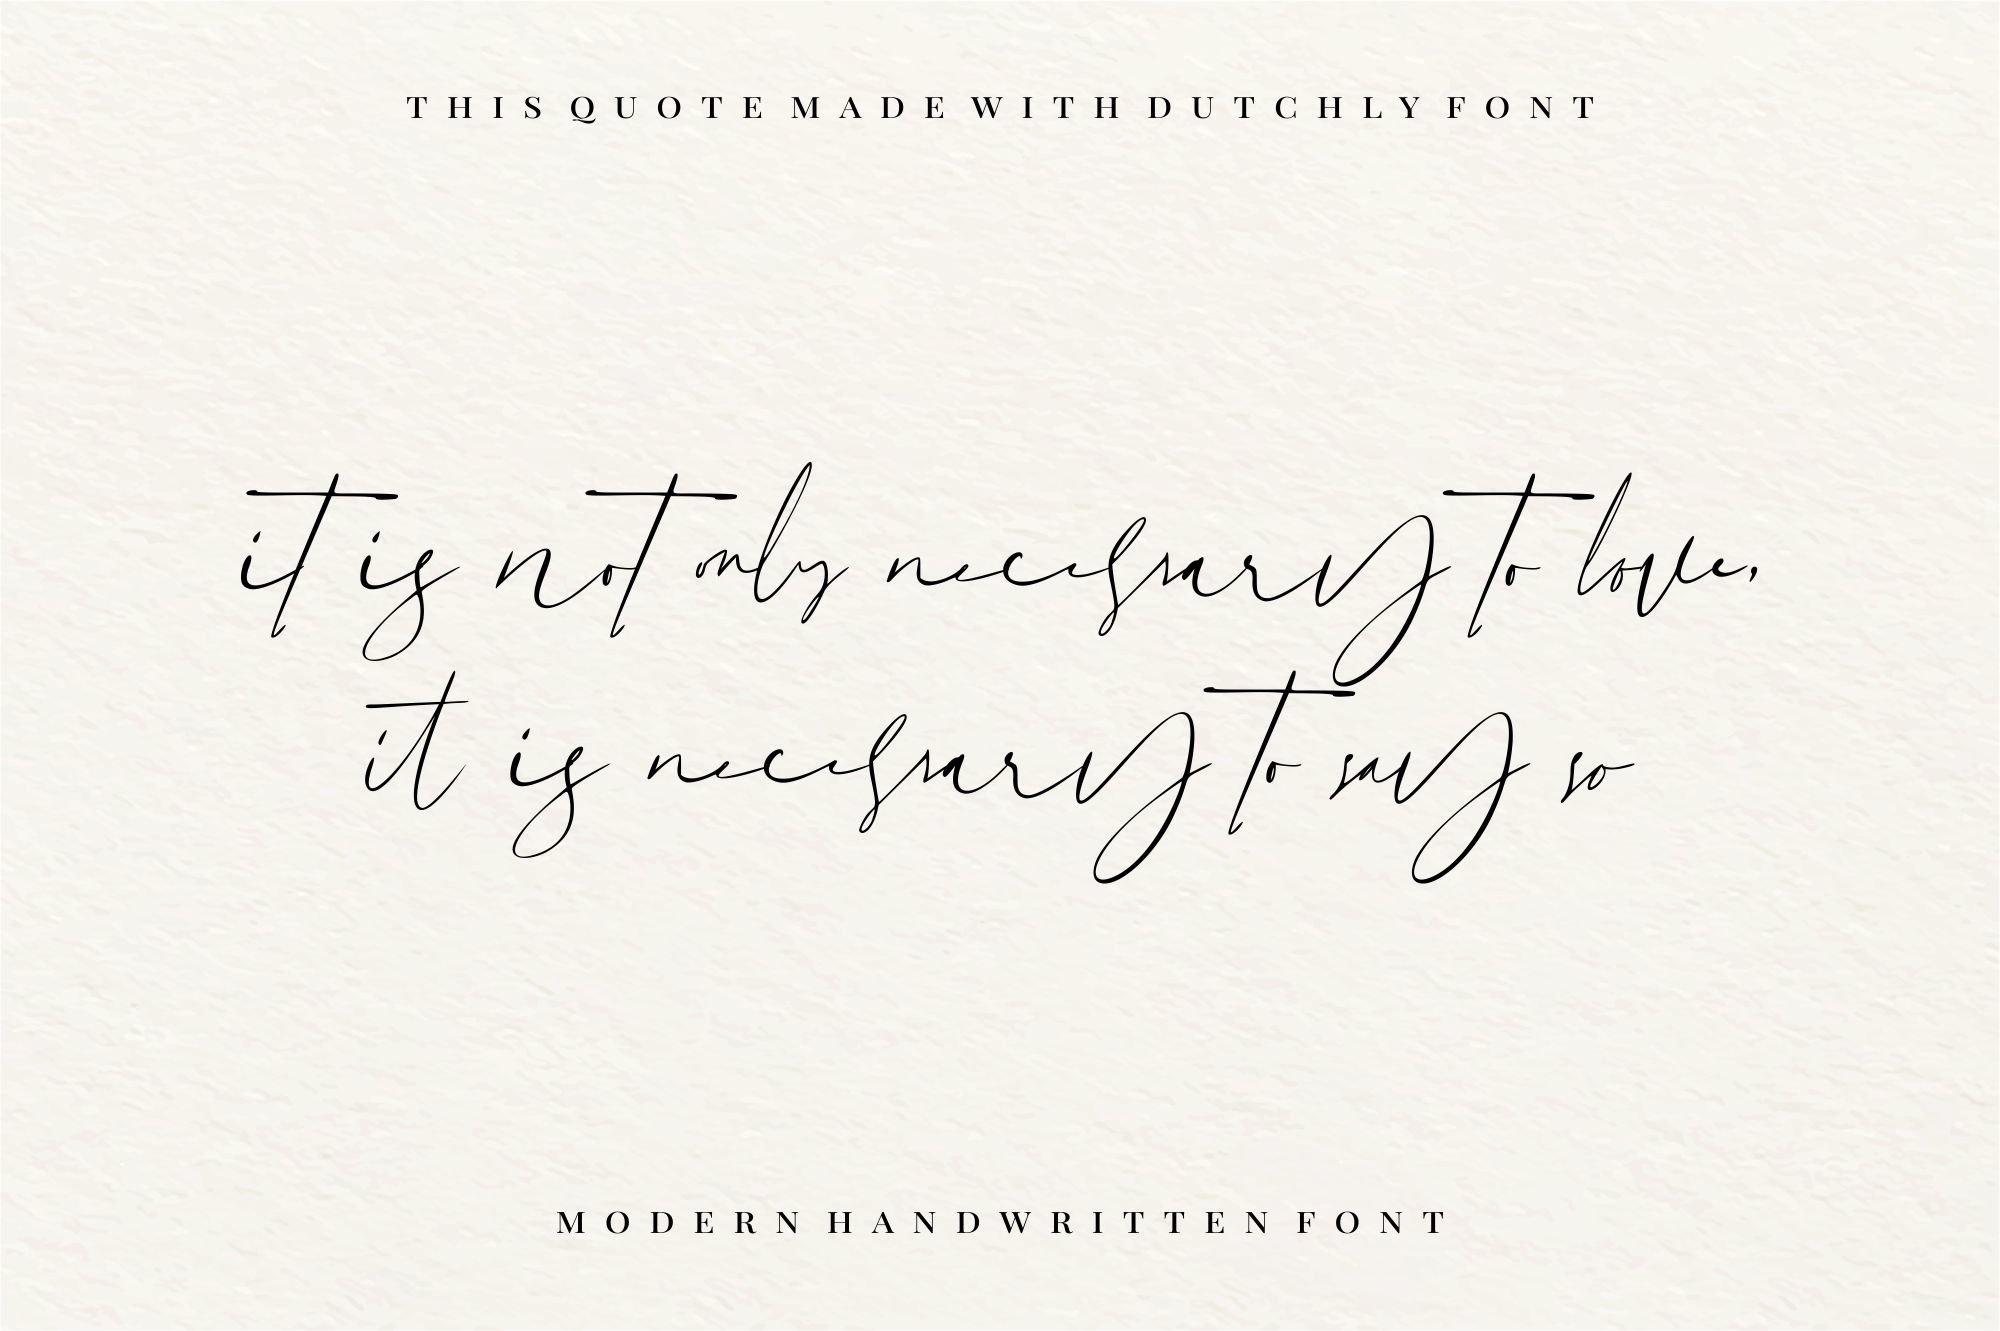 Dutchly - Modern Handwritten example image 3